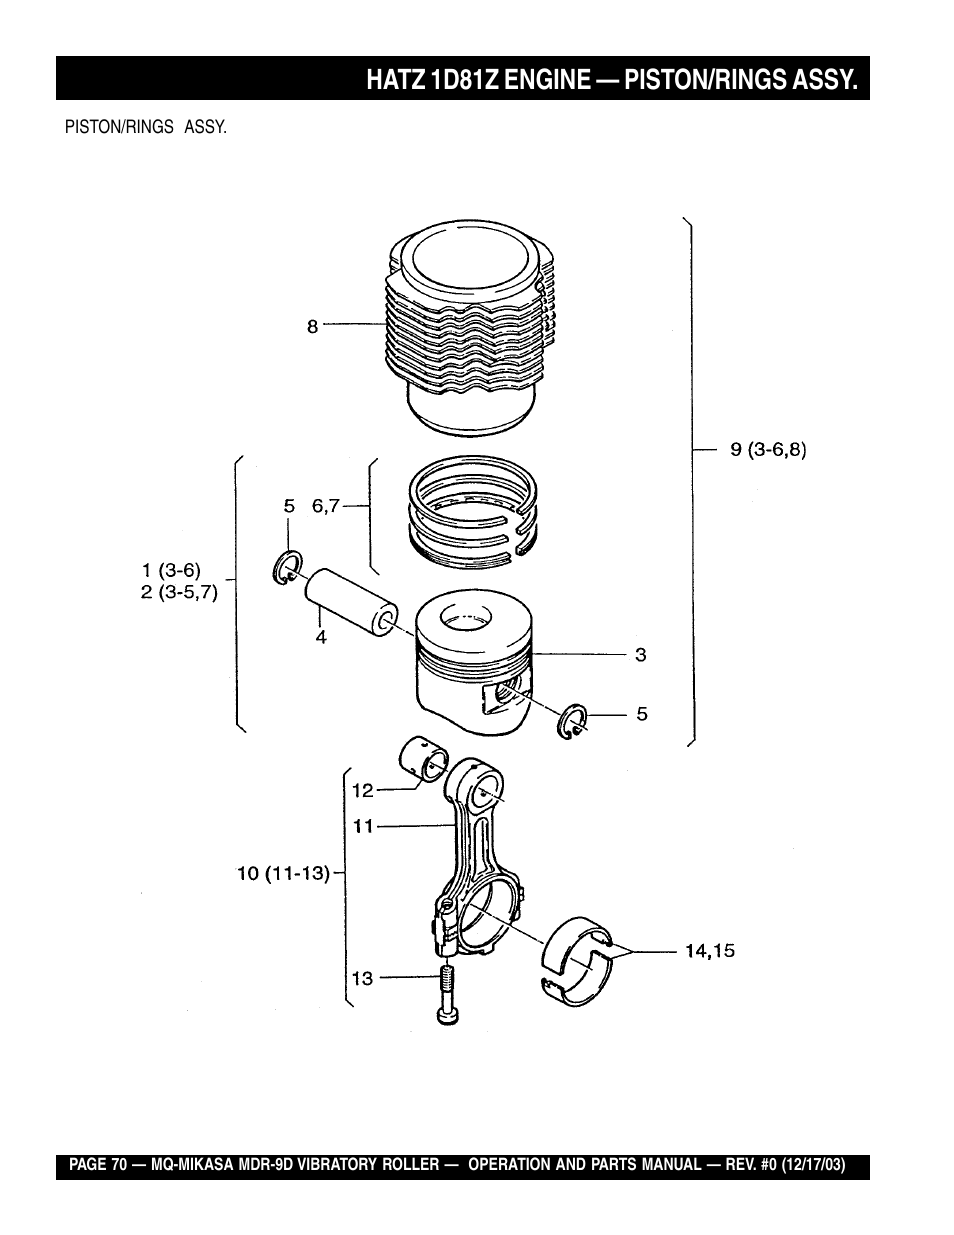 medium resolution of hatz 1d81z engine piston rings assy multiquip mikasa vibratory walk behind roller mdr 9d user manual page 70 104